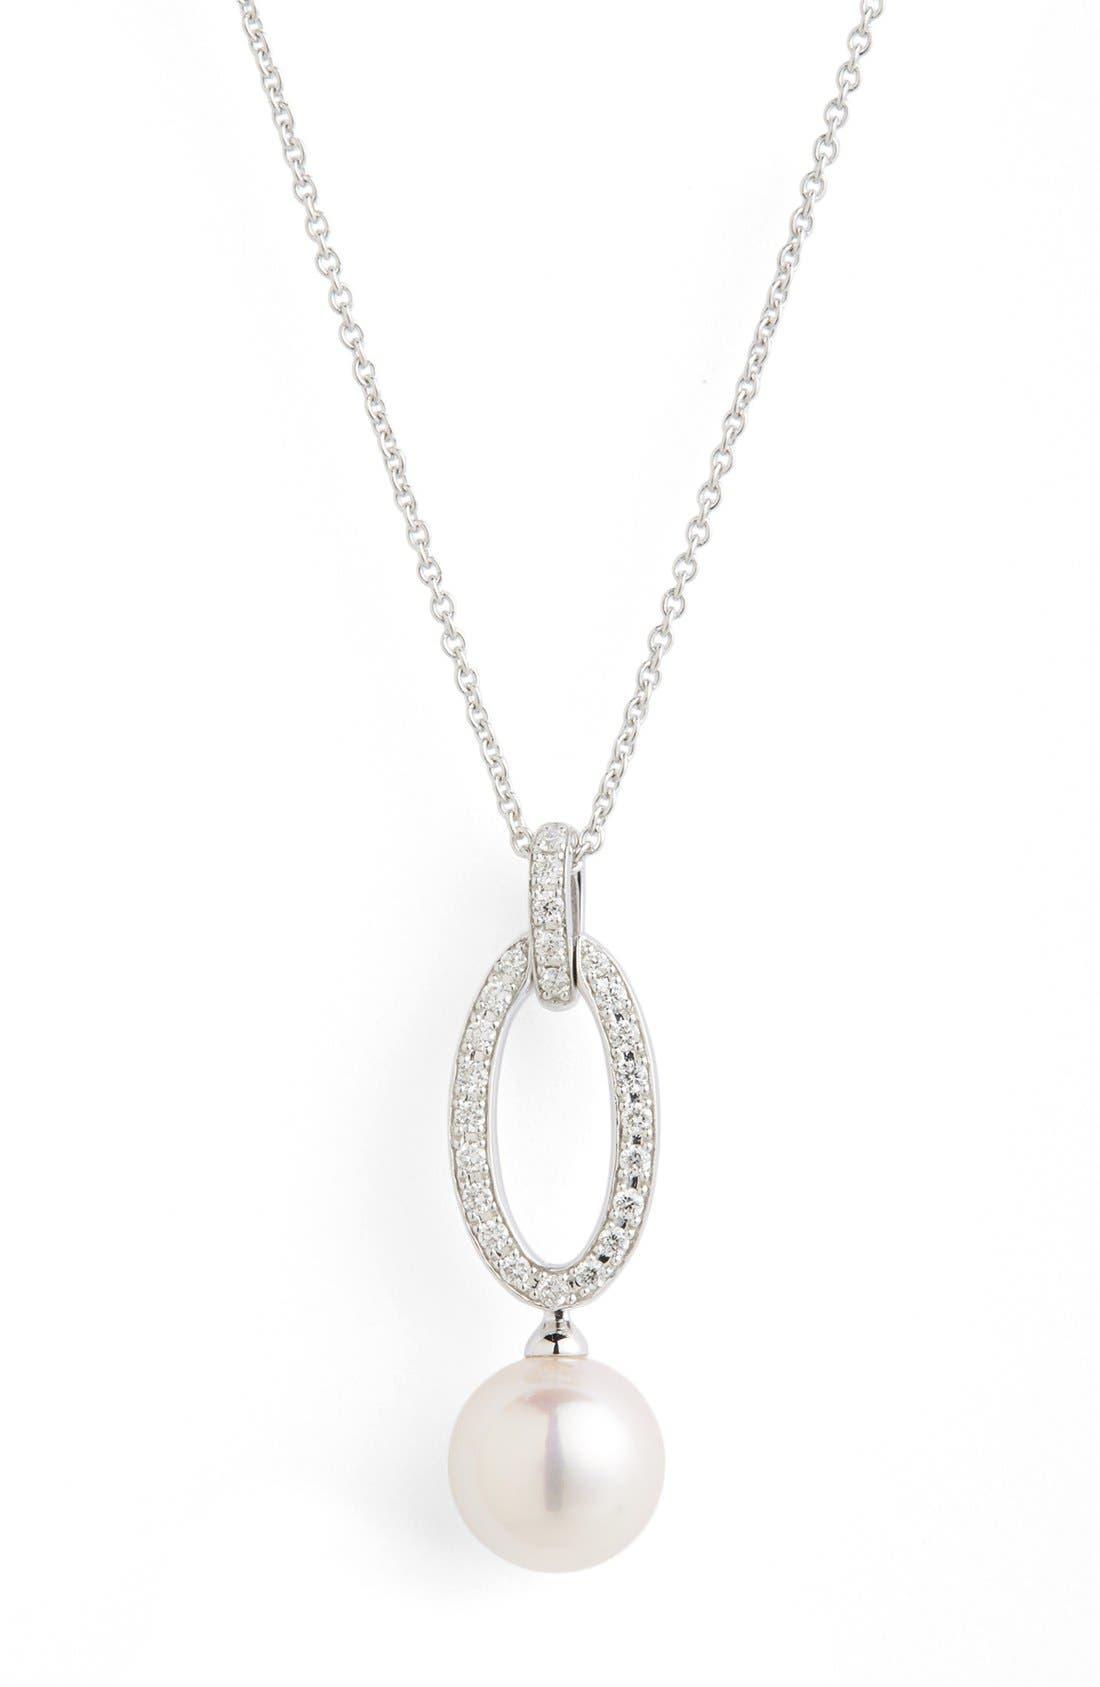 Diamond & Akoya Cultured Pearl Pendant Necklace,                             Alternate thumbnail 4, color,                             WHITE GOLD